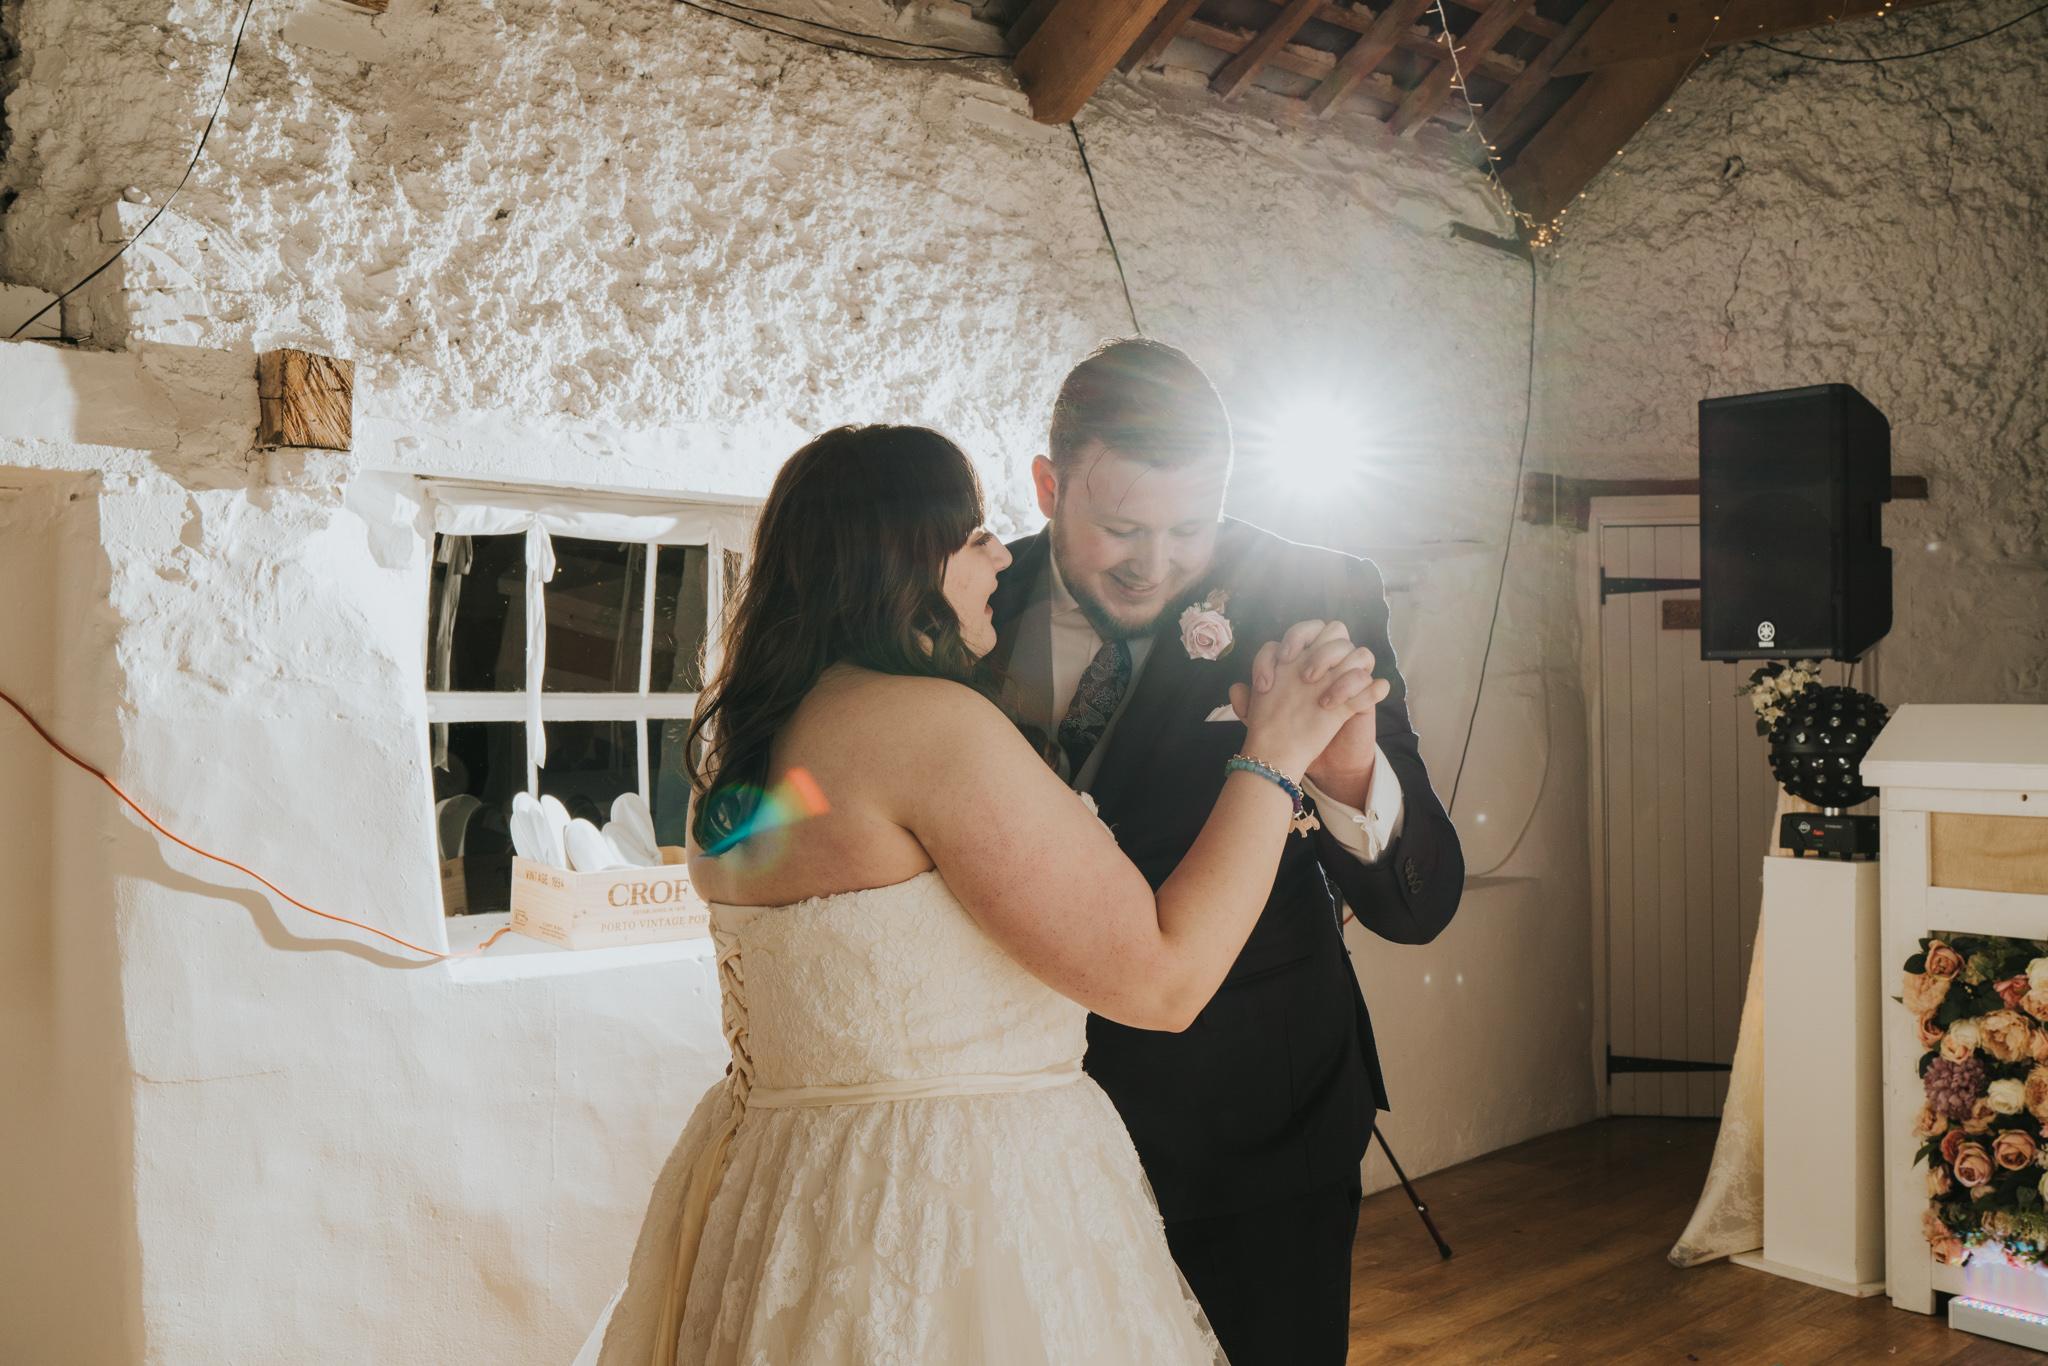 grace-sam-old-barn-clovelly-devon-wedding-photographer-grace-elizabeth-essex-suffolk-norfolk-wedding-photographer (117 of 132).jpg